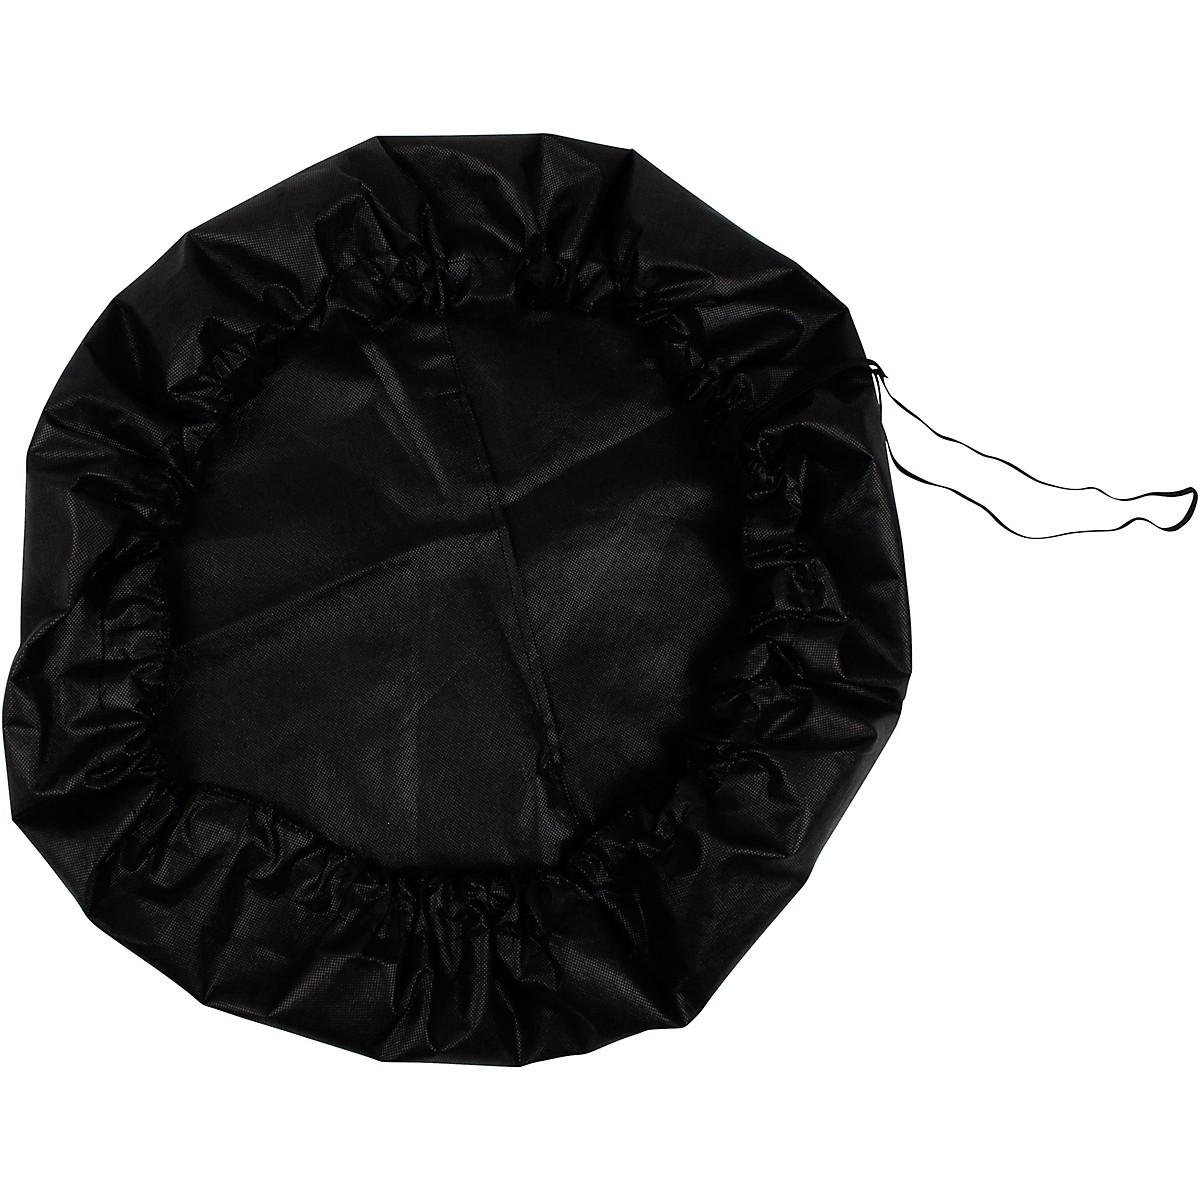 Gator Black Bell Mask With MERV-13 Filter, 30-32